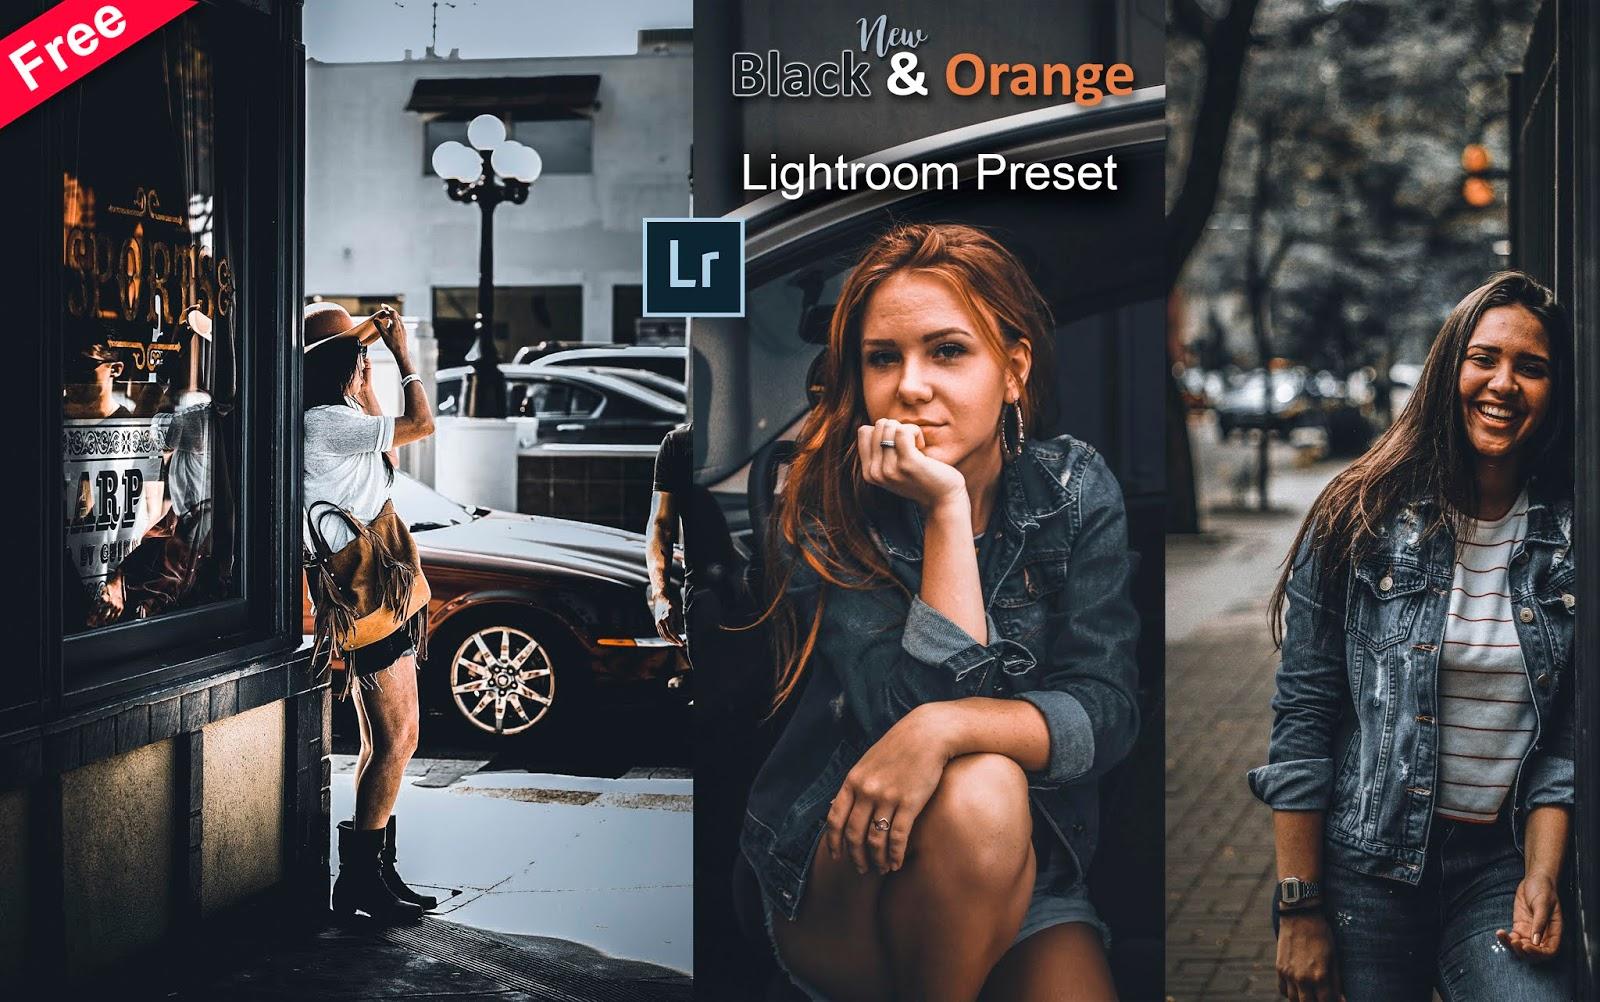 Download New Black & Orange Lightroom Preset for Free | How to Edit Your Photos to Black & Orange Effect in Lightroom